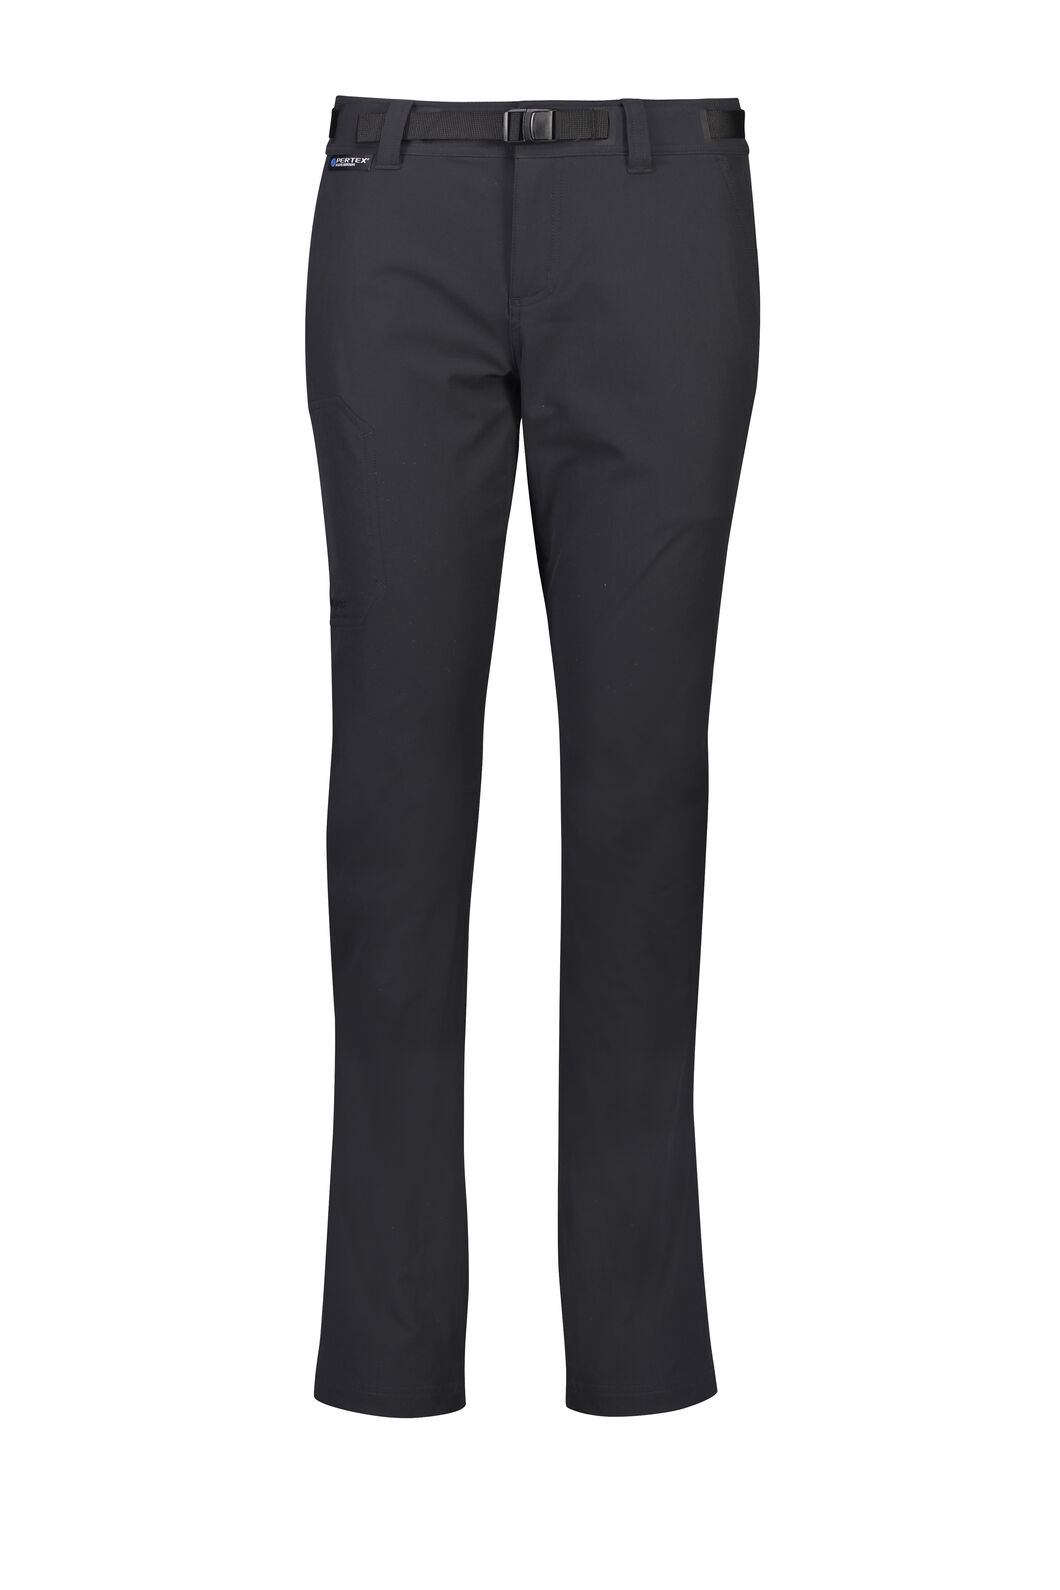 Macpac Trekker Pertex Equilibrium® Softshell Pants - Women's, Black, hi-res